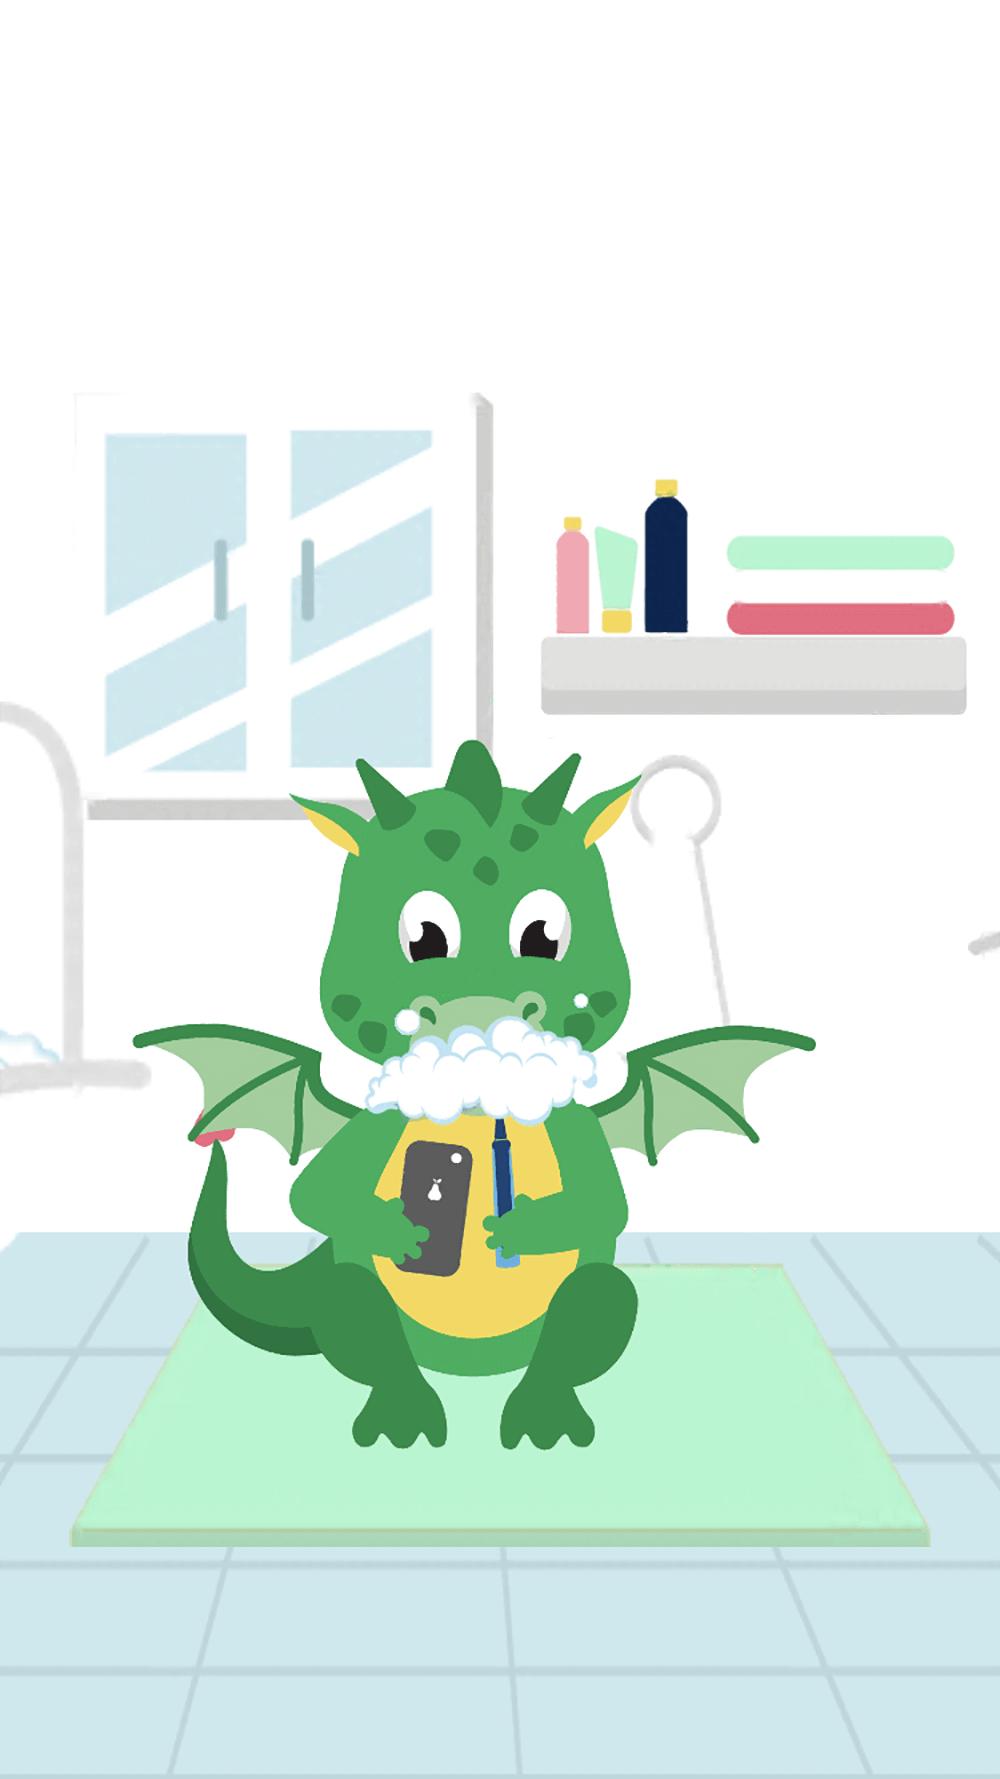 Little green dragon brushing his teeth